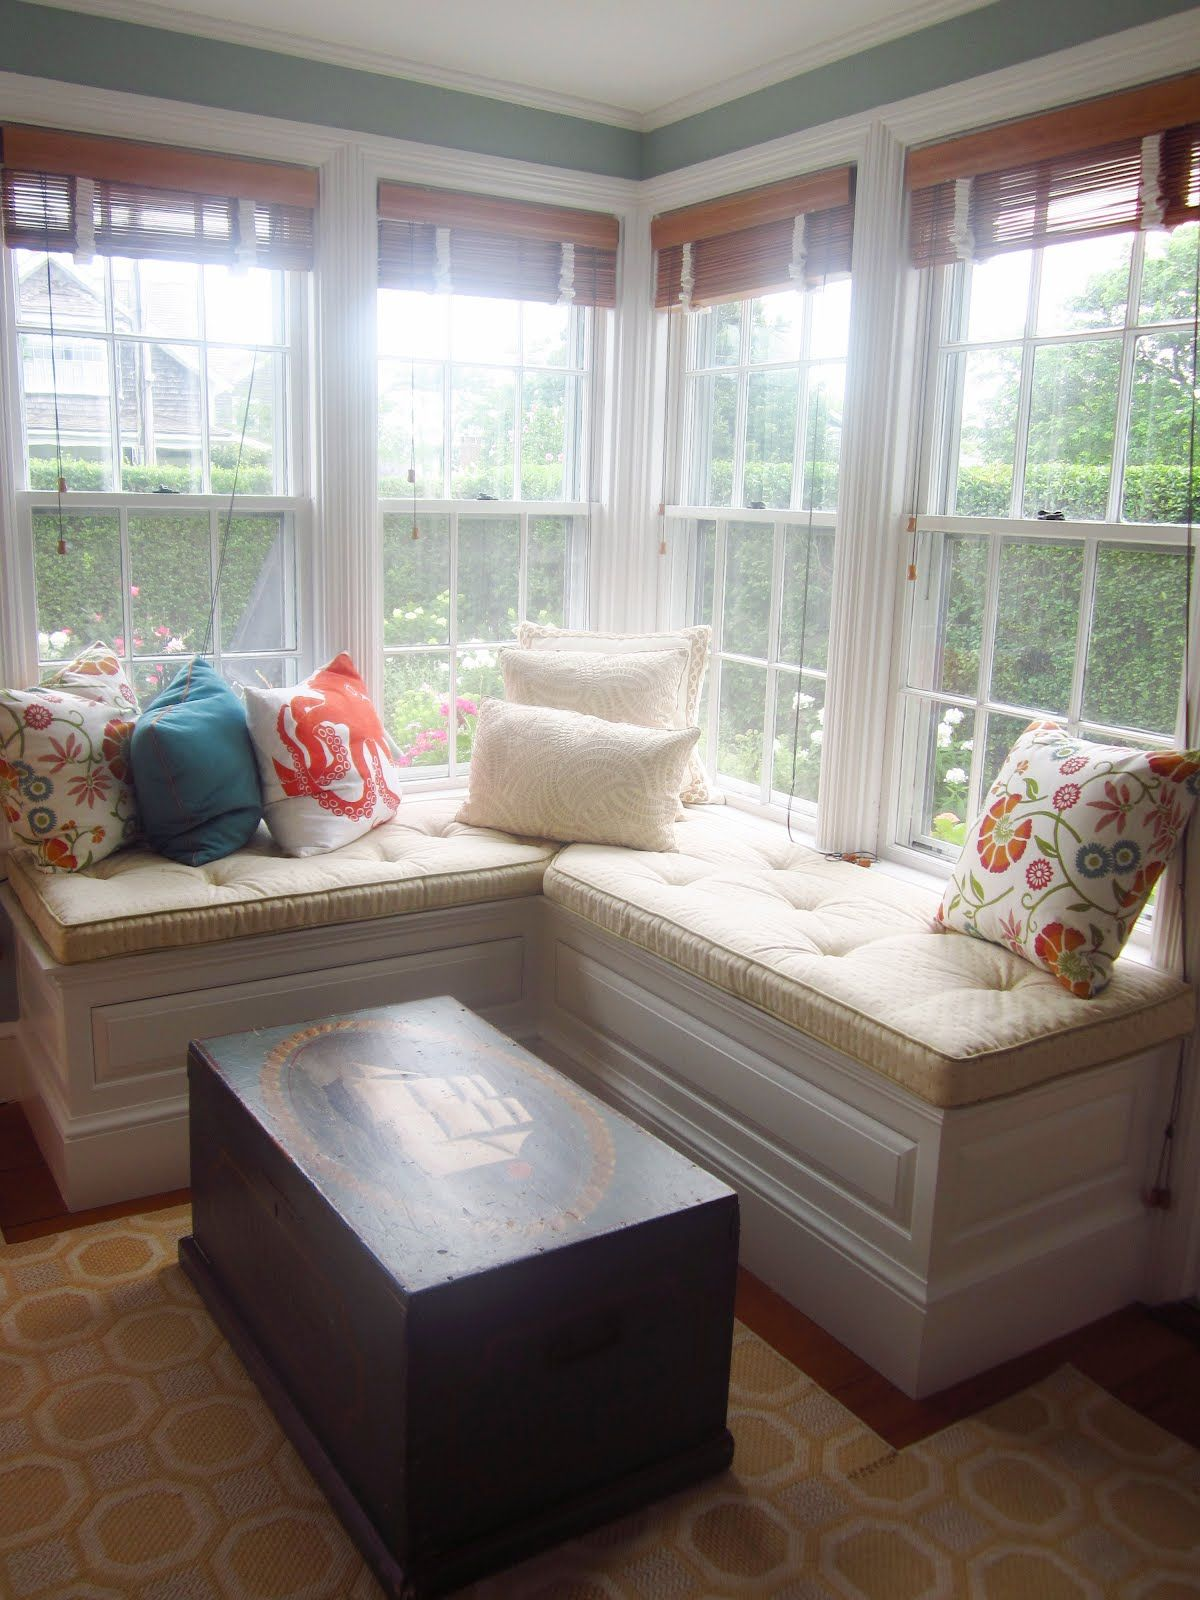 Strange Island Preppy Living Room Corner Window Seats Corner Ncnpc Chair Design For Home Ncnpcorg